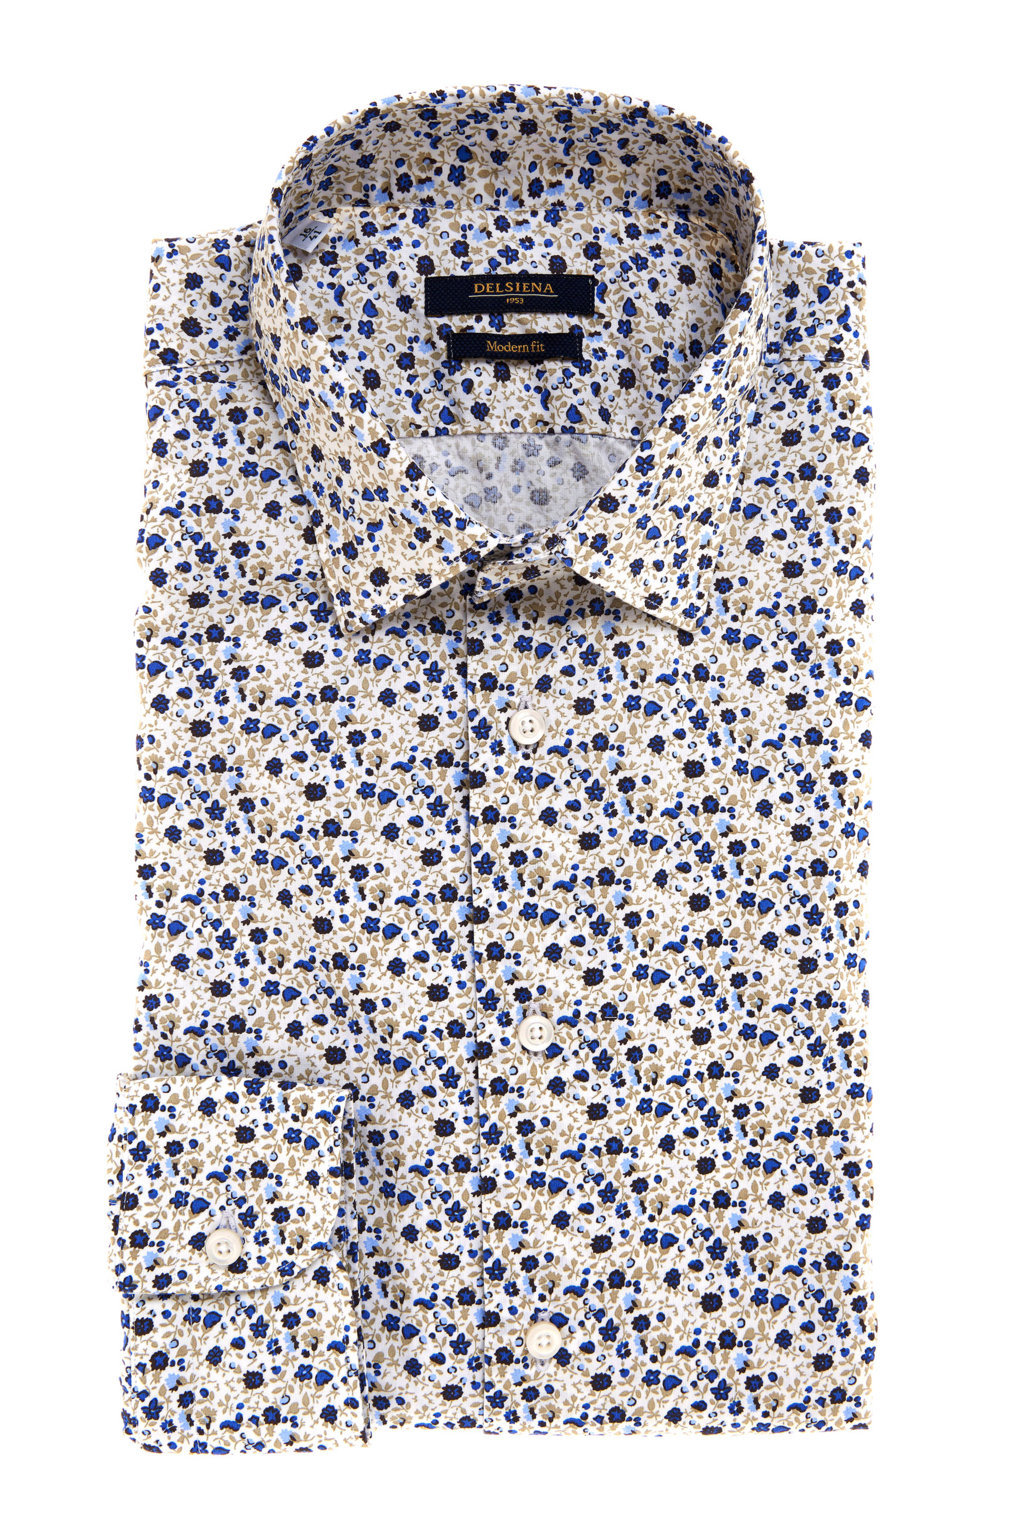 Camicia fantasia floreale Delsiena